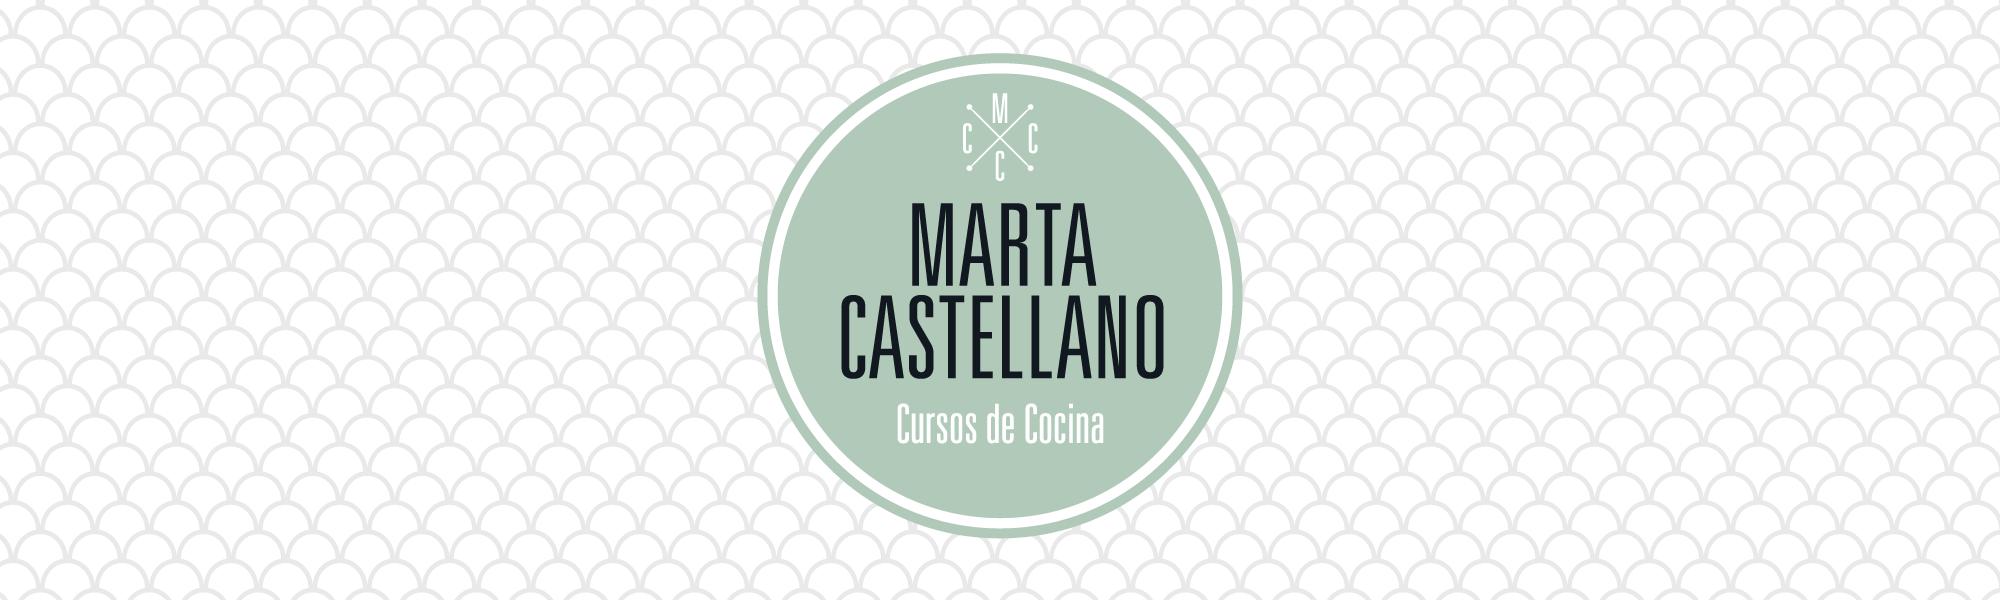 lagalga · Marta Castellano